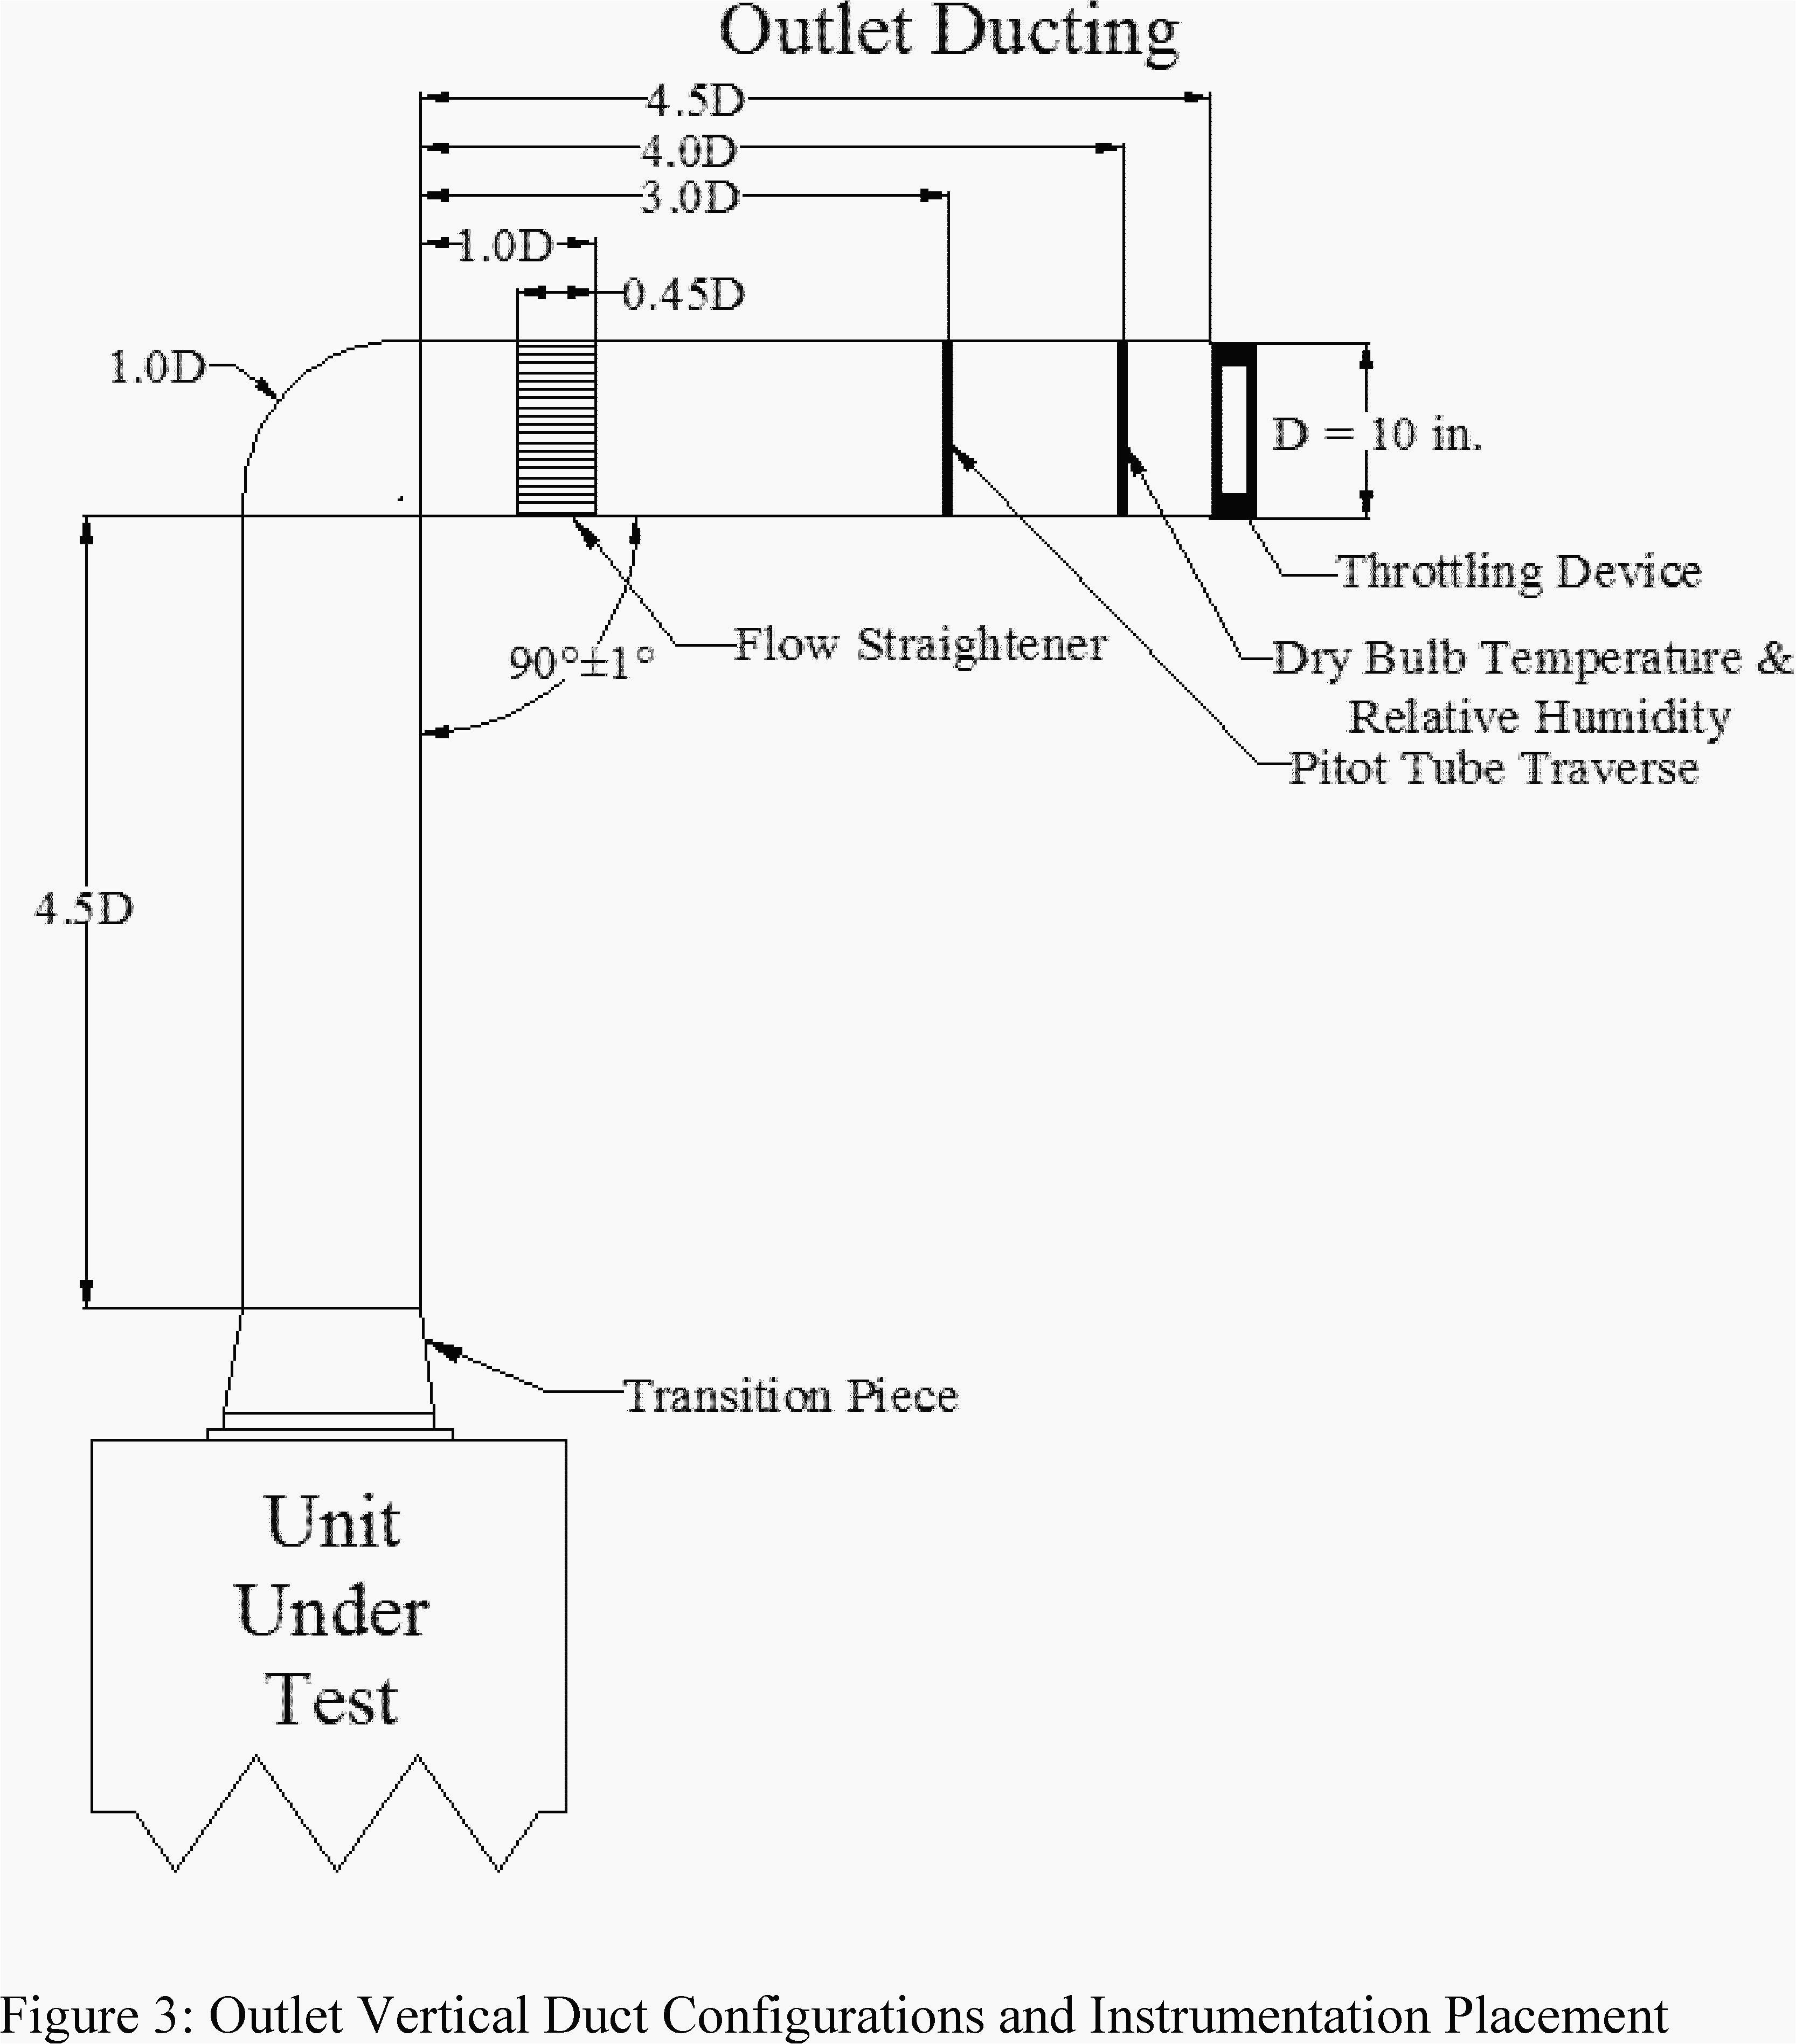 wiring diagram de walt dw306 wiring diagram review wiring diagram de walt dw306